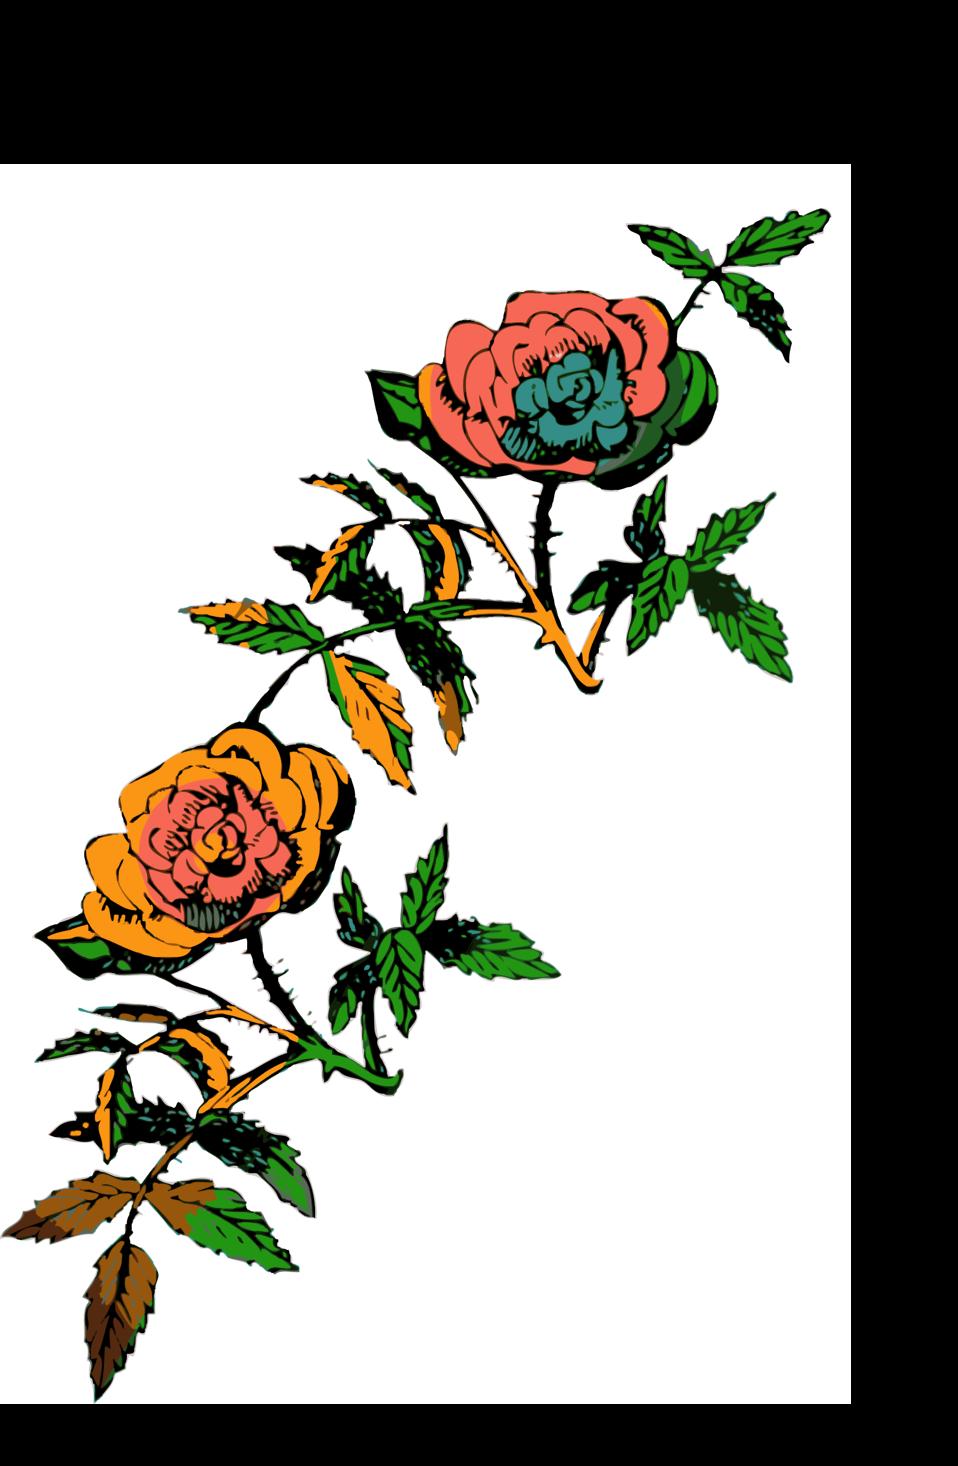 Rose decoration in color